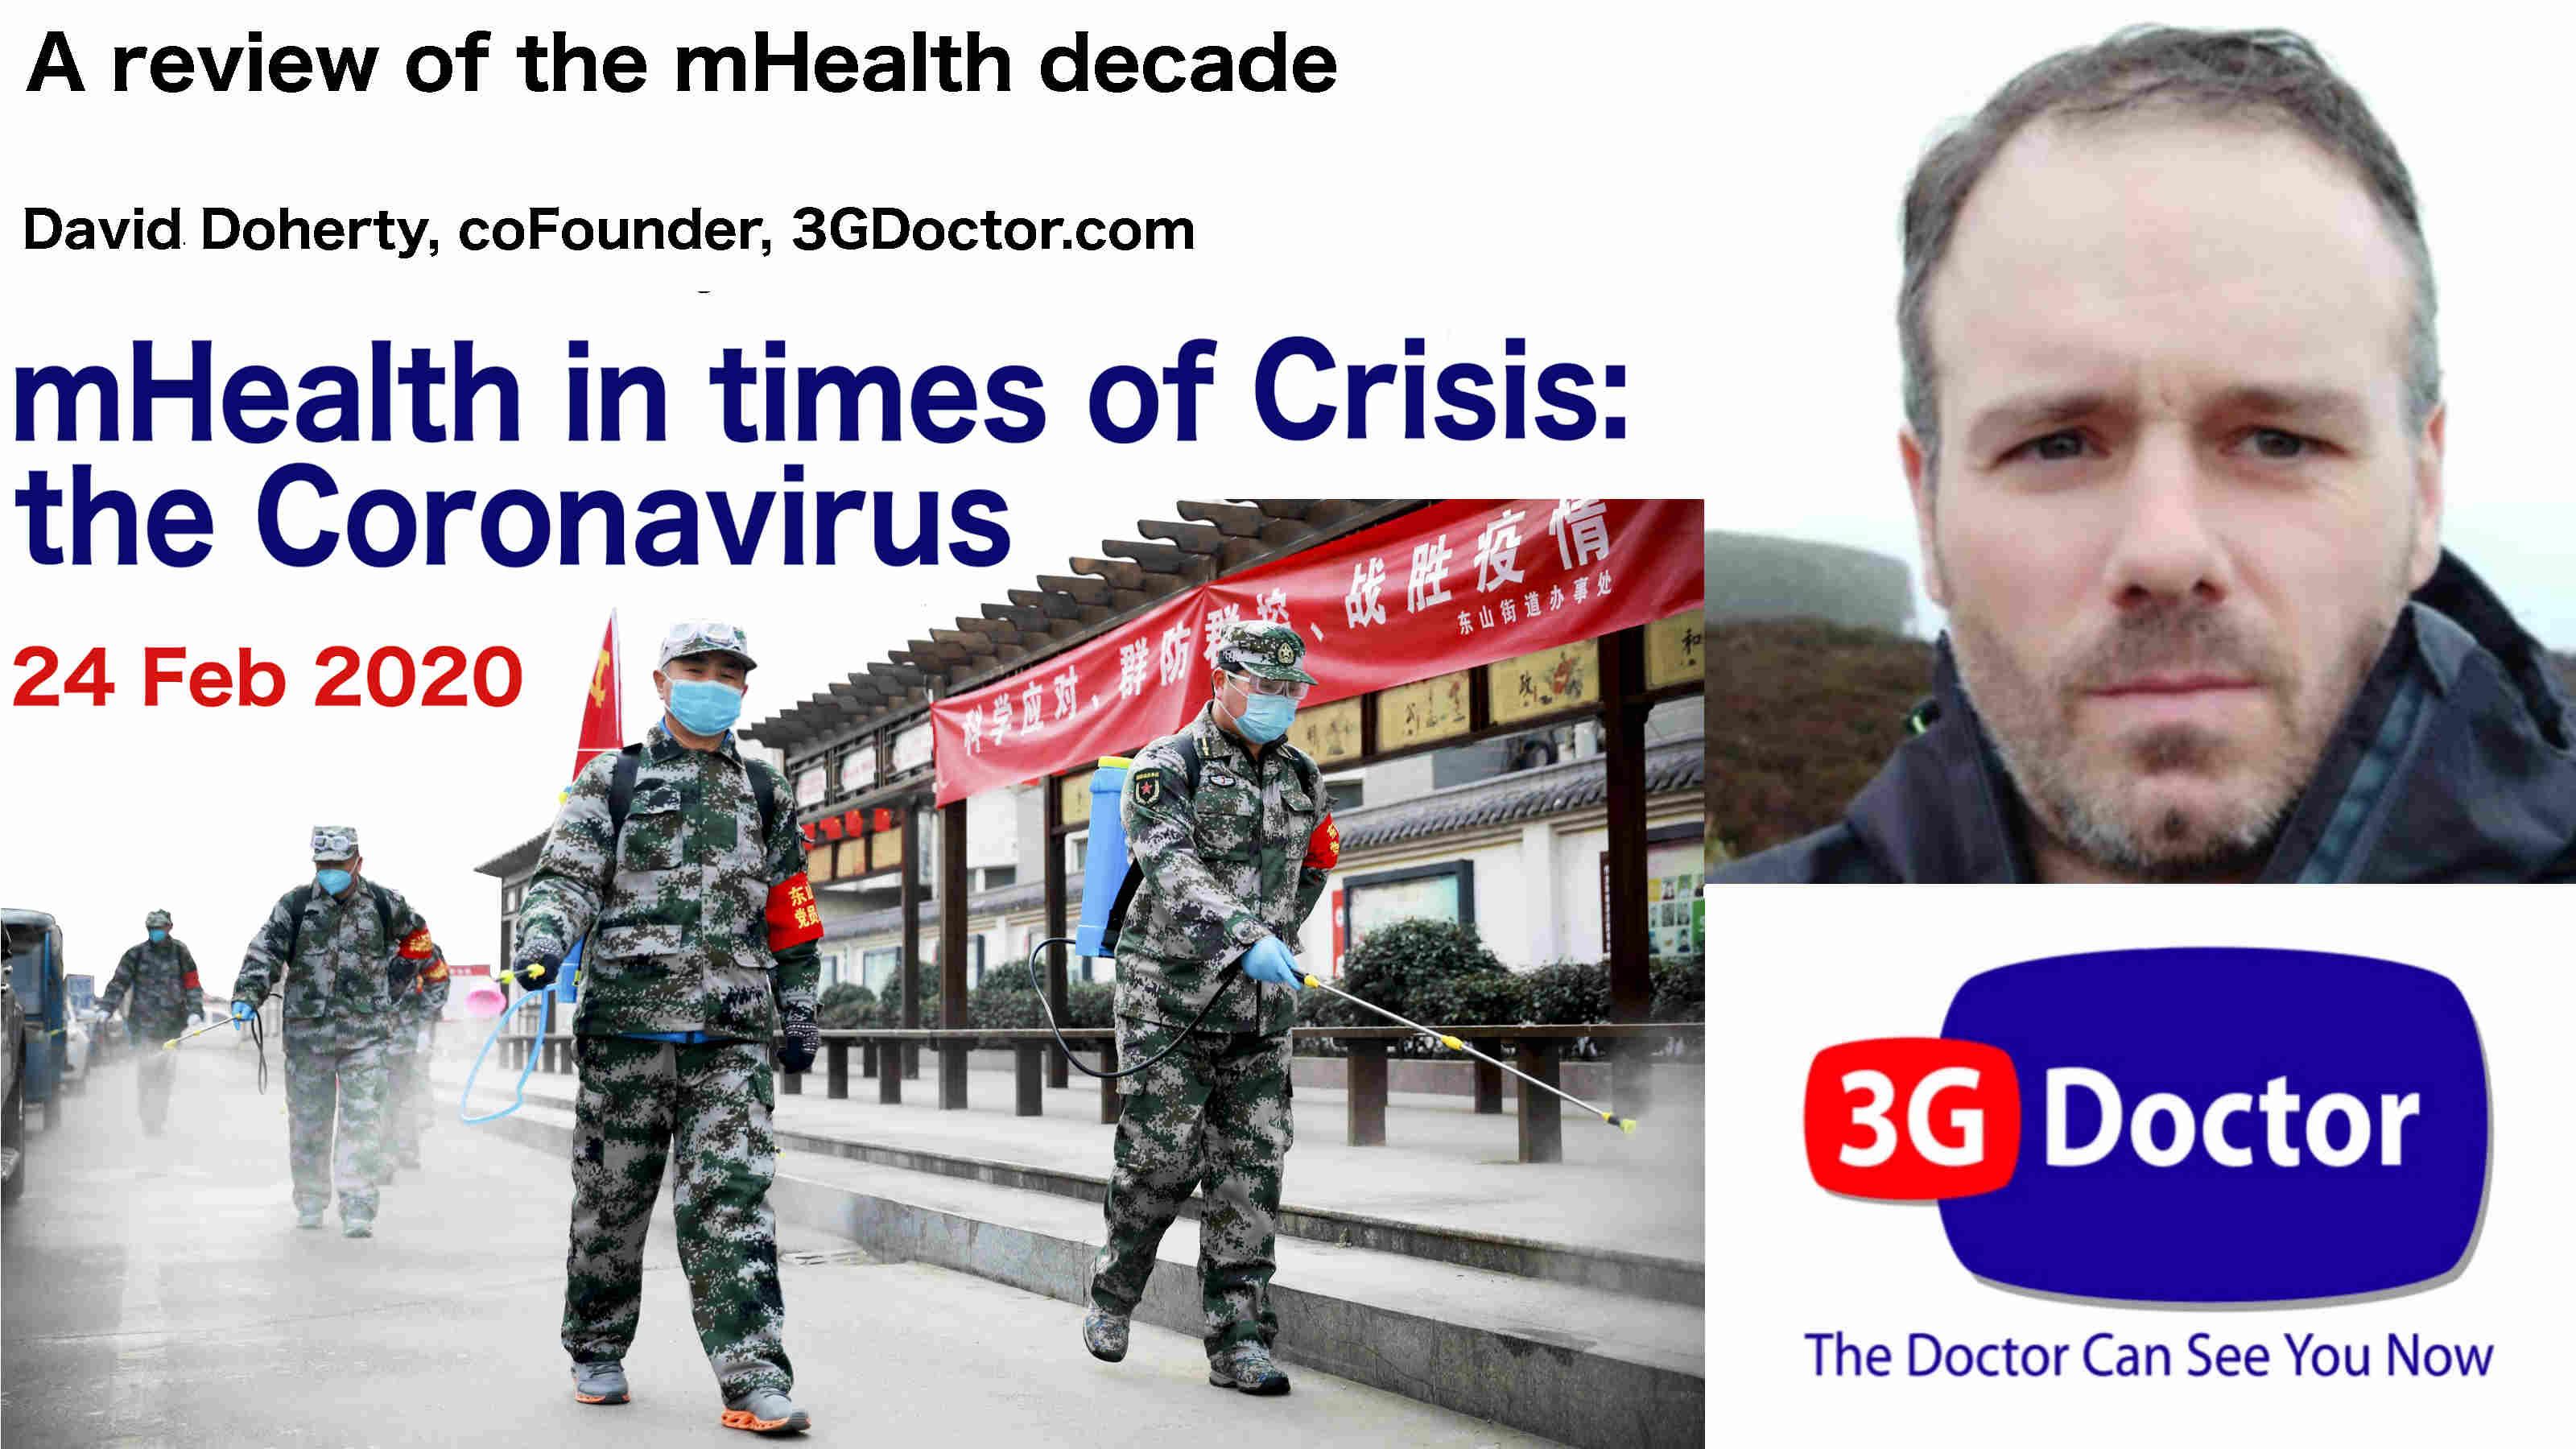 mHealth in Crisis David Doherty